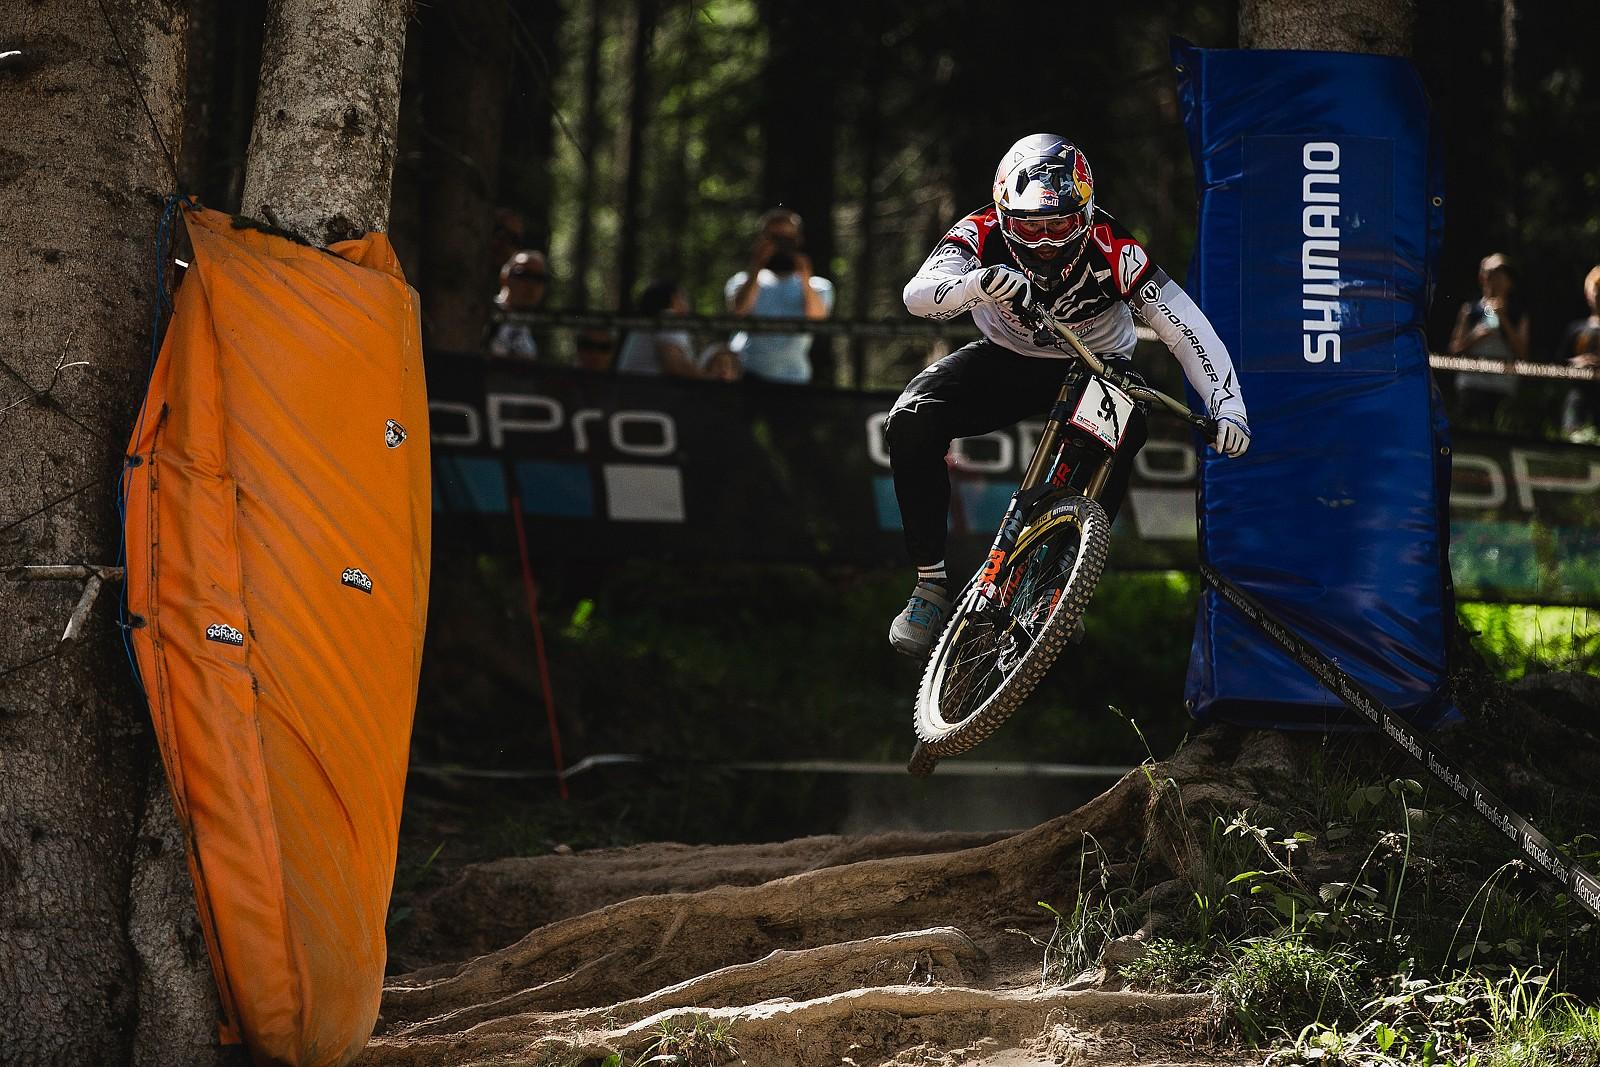 Pure Style, Brook Macdonald - A Big Bad Batch of Brook Macdonald Bangers - Mountain Biking Pictures - Vital MTB